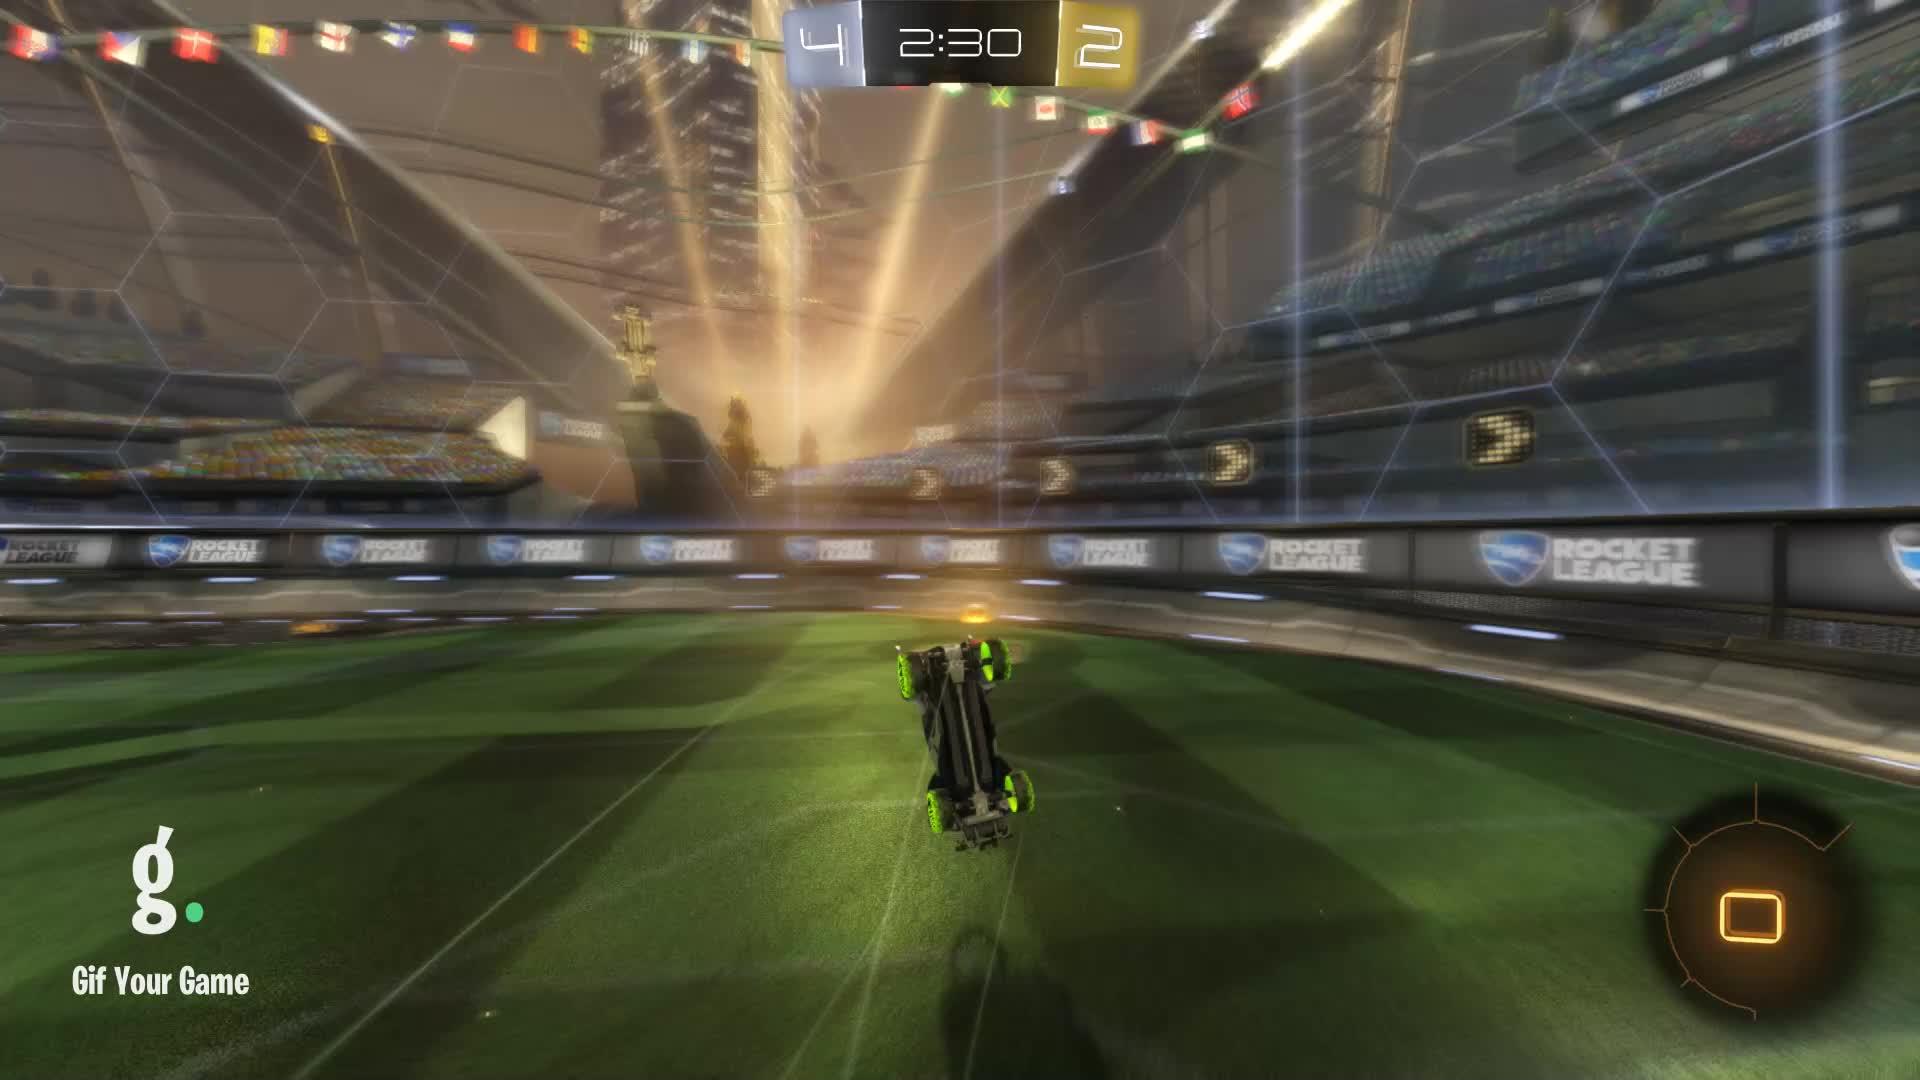 Gif Your Game, GifYourGame, Rocket League, RocketLeague, Zoar, Zoar Clip 1 GIFs